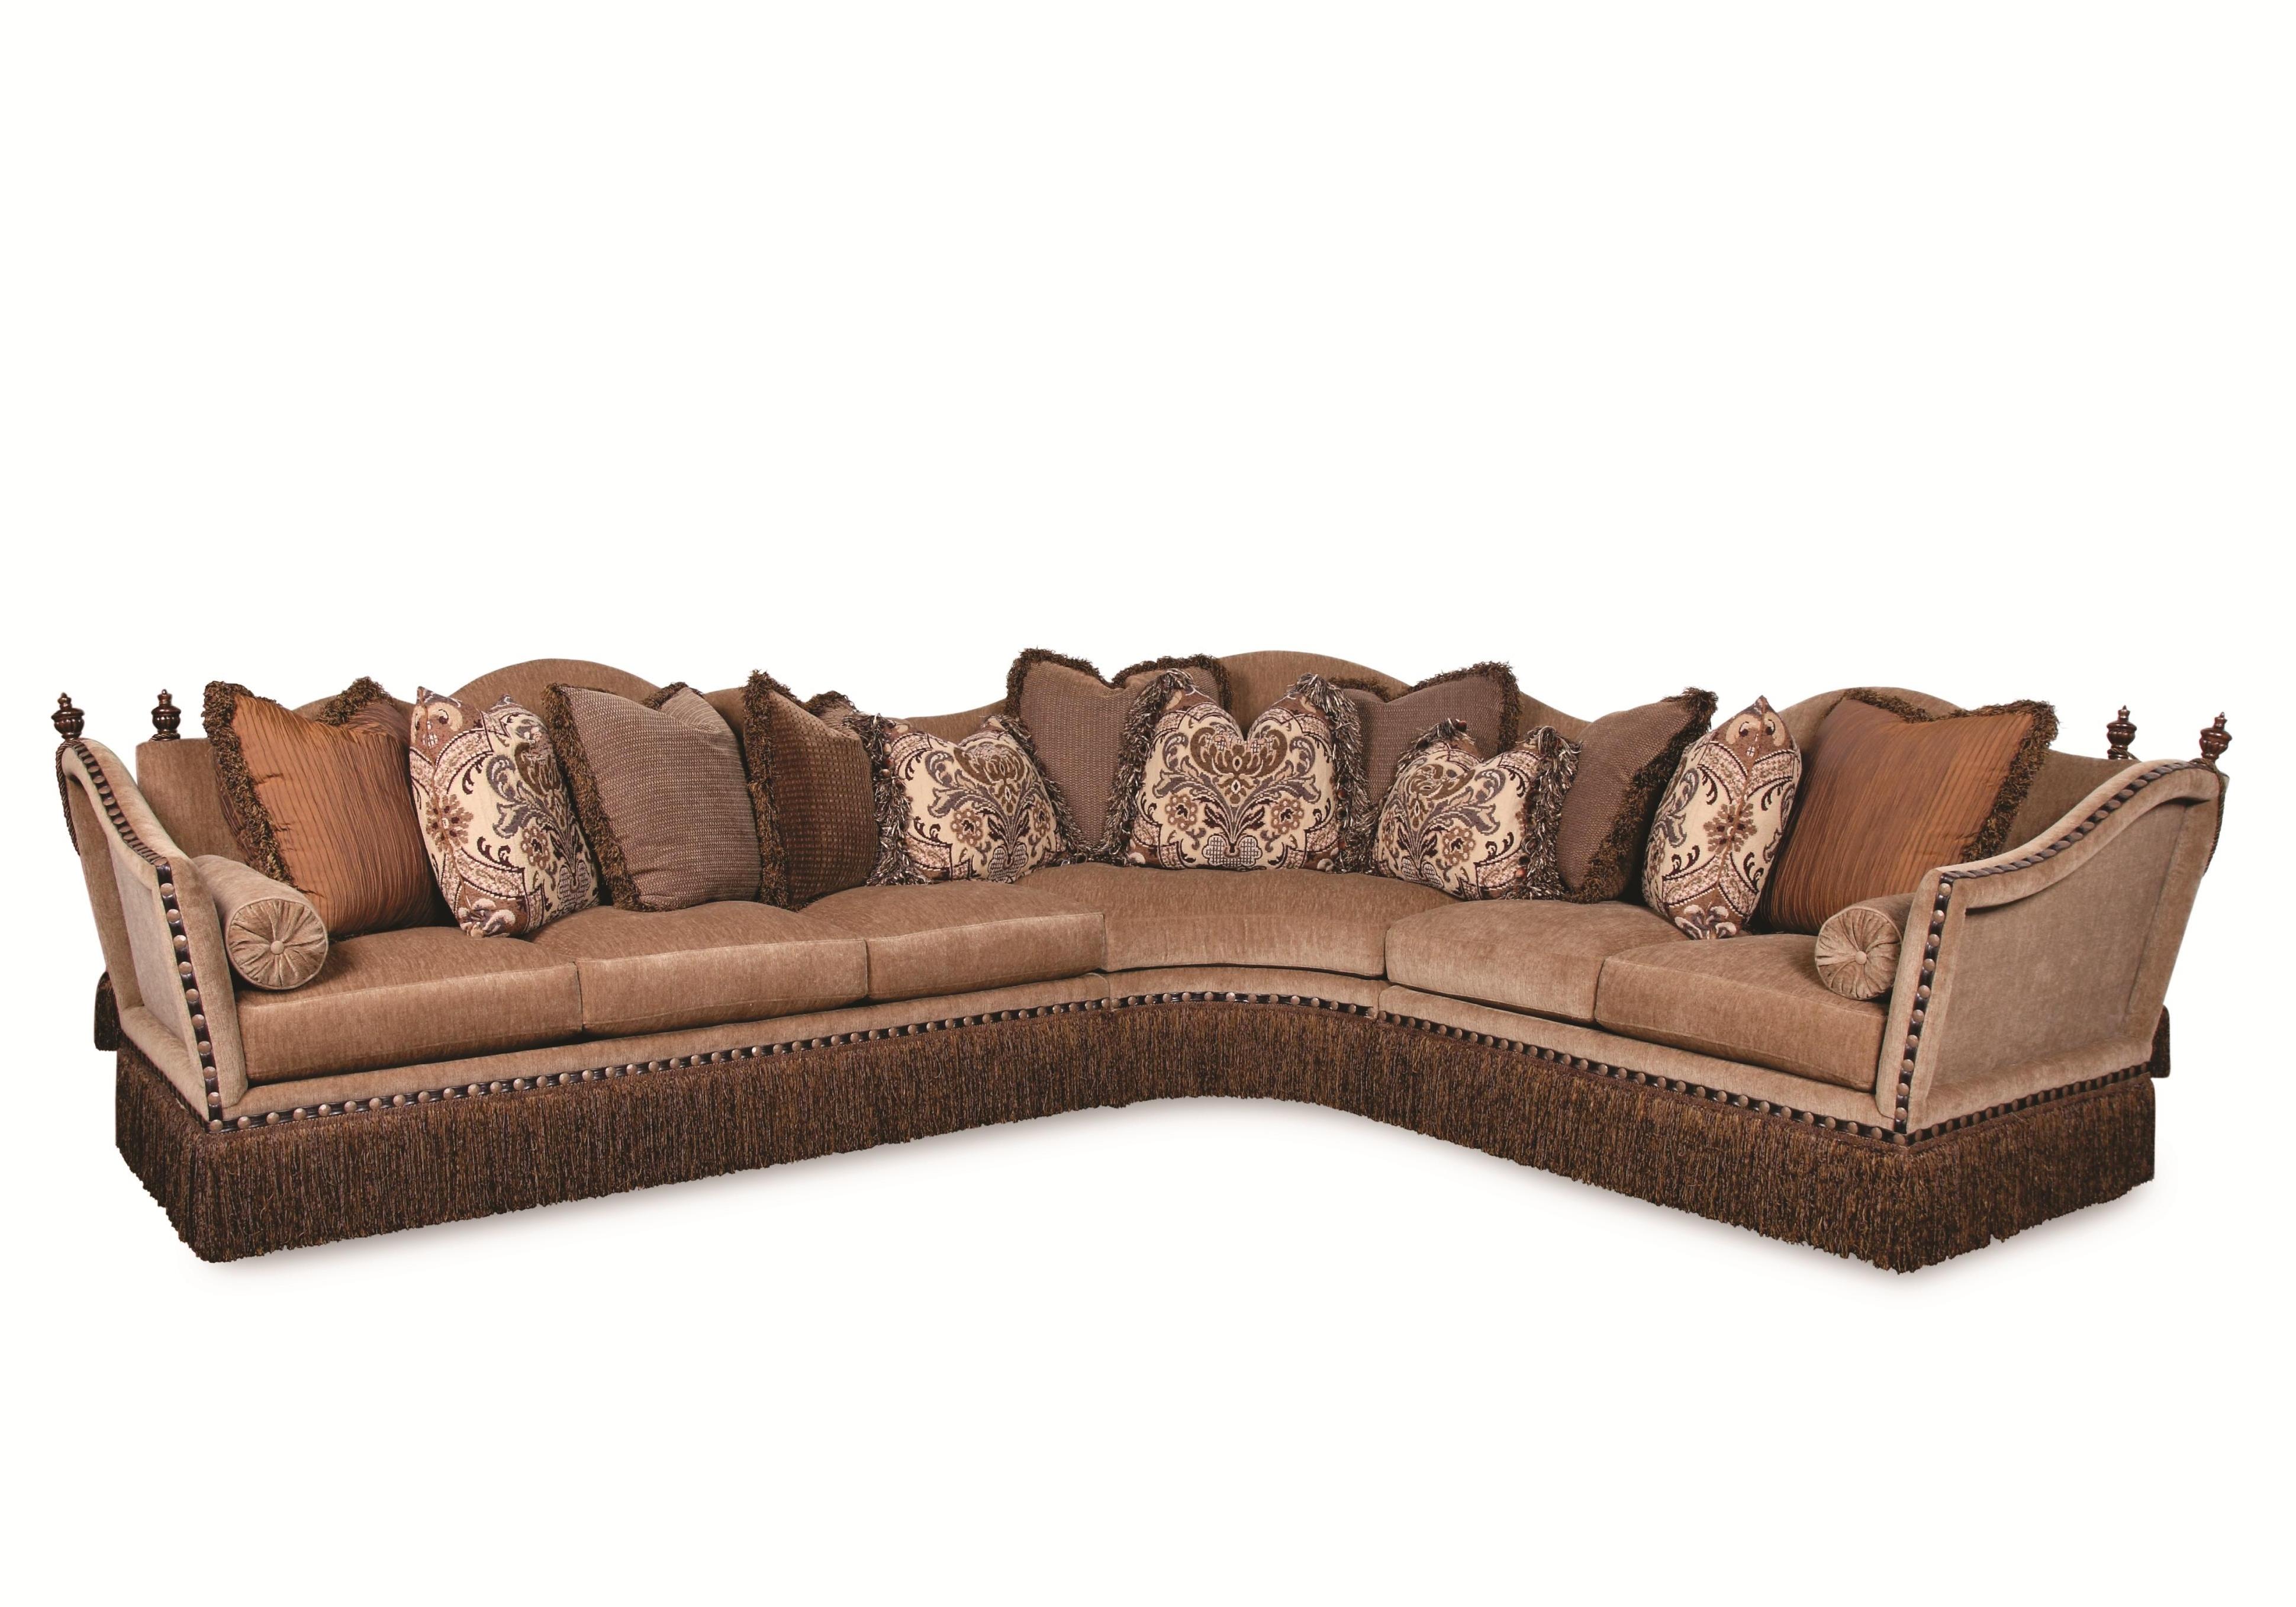 Home Regarding Sectional Sofas In Savannah Ga (View 7 of 15)